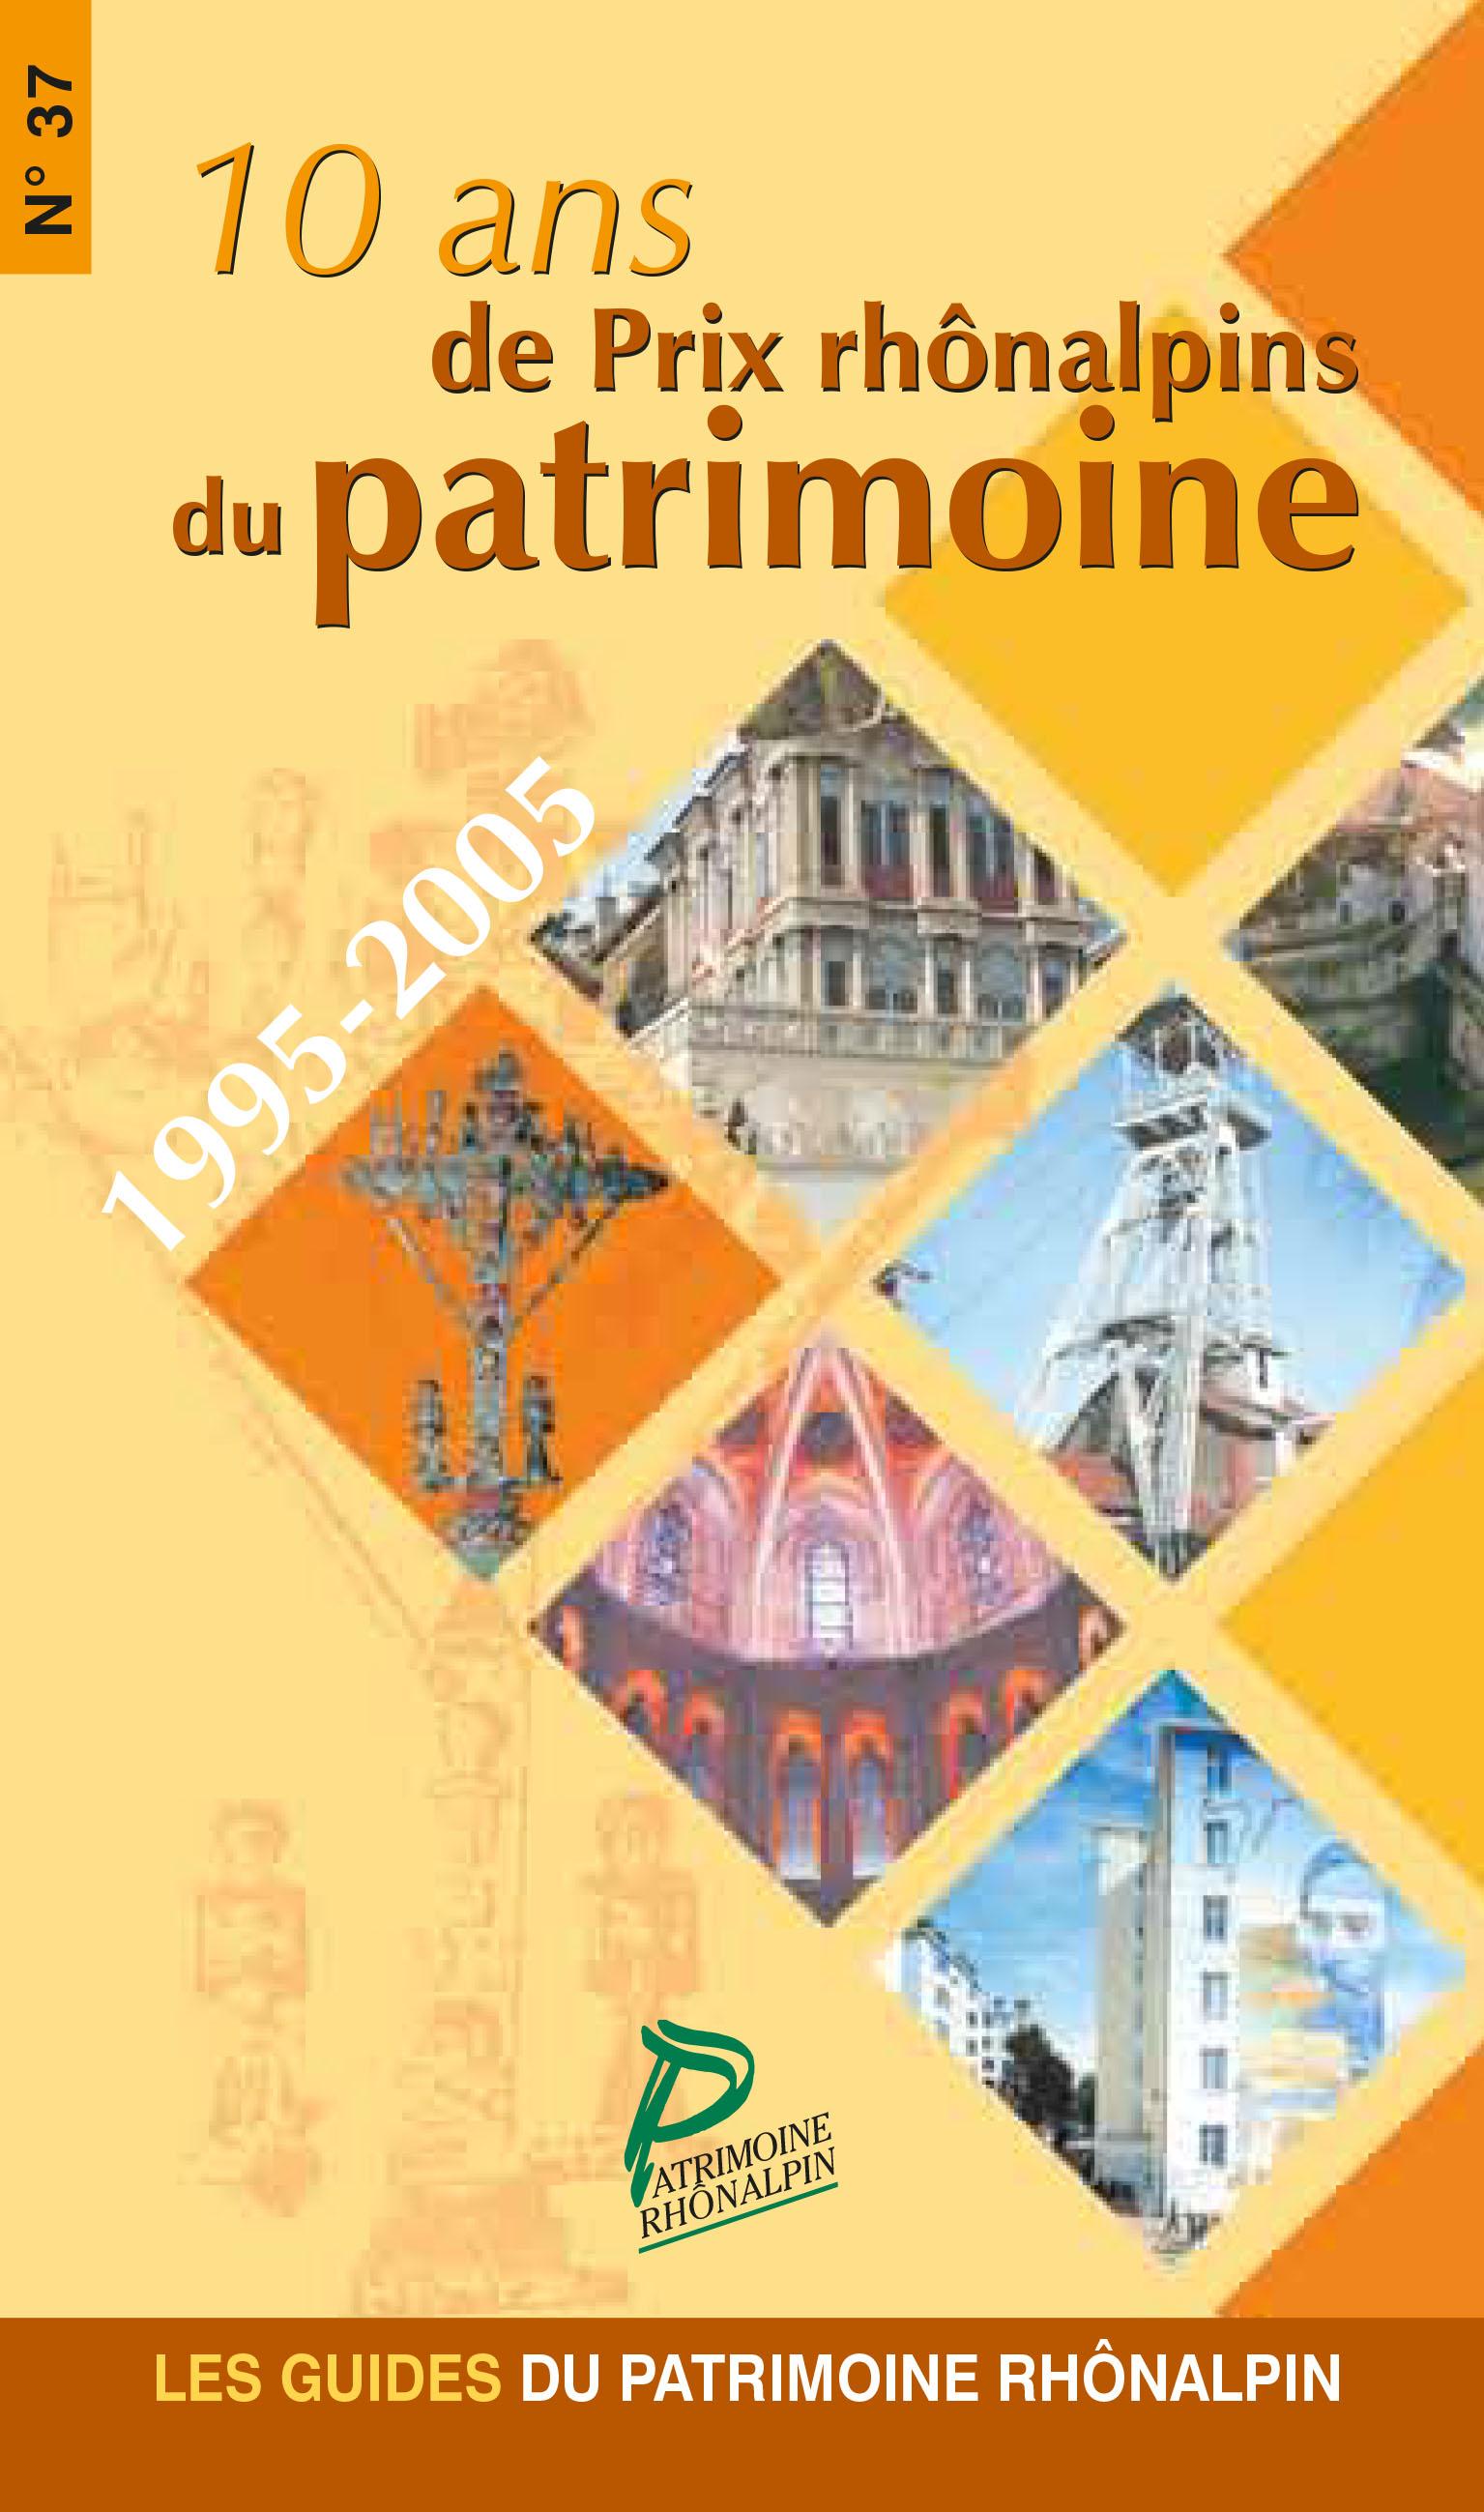 Guide n°37 – 10 ans de Prix rhônalpins du patrimoine